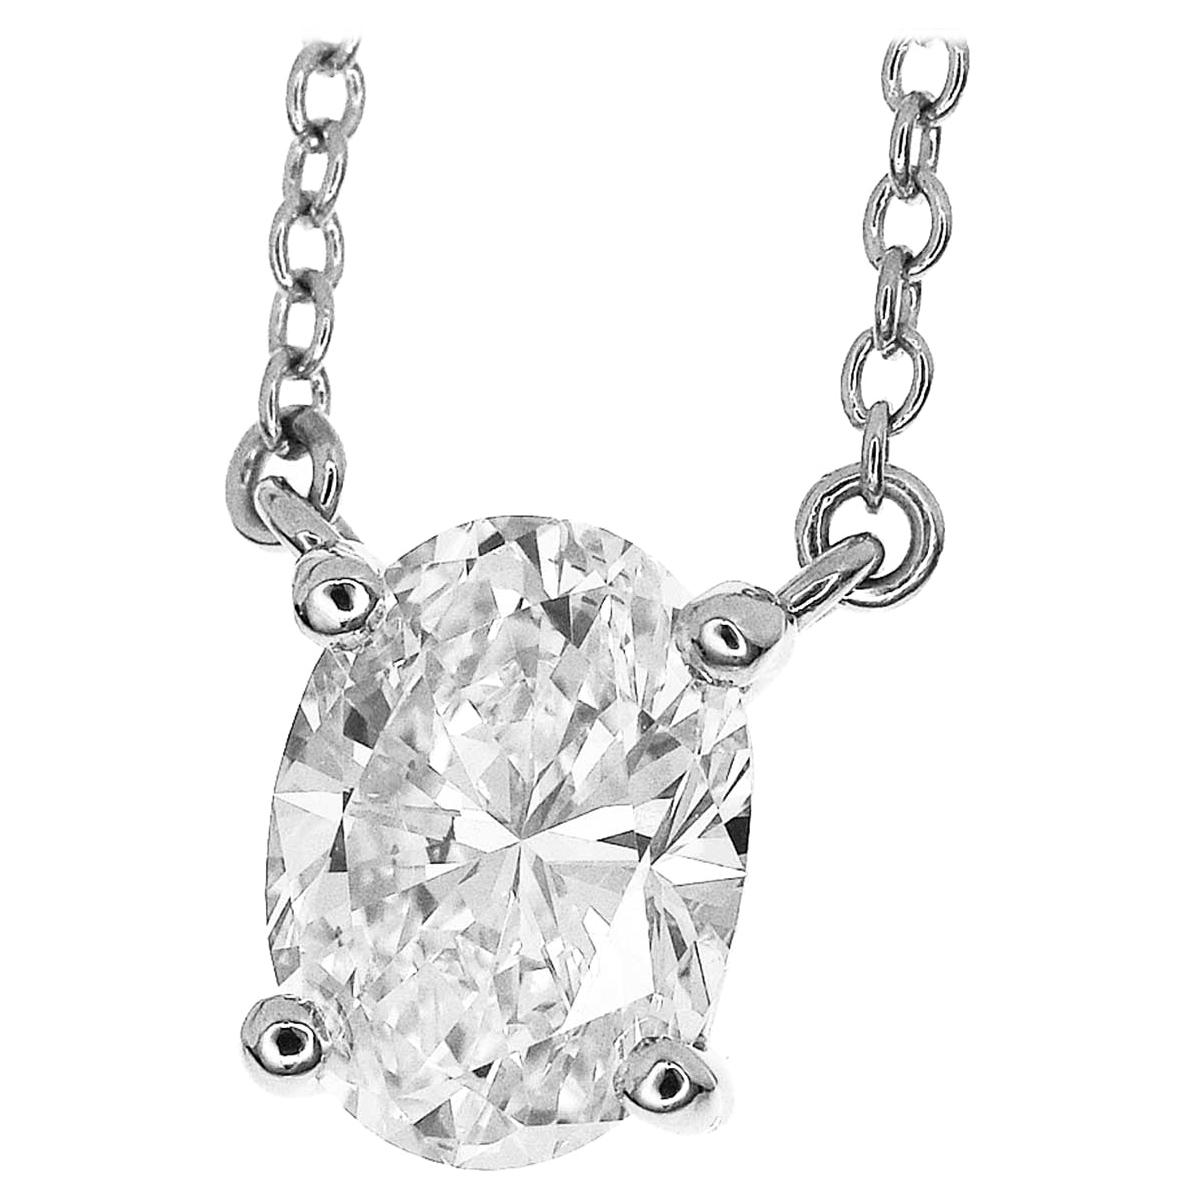 Tiffany & Co. Solitaire 1.02ct Diamond Platinum Pendant Necklace